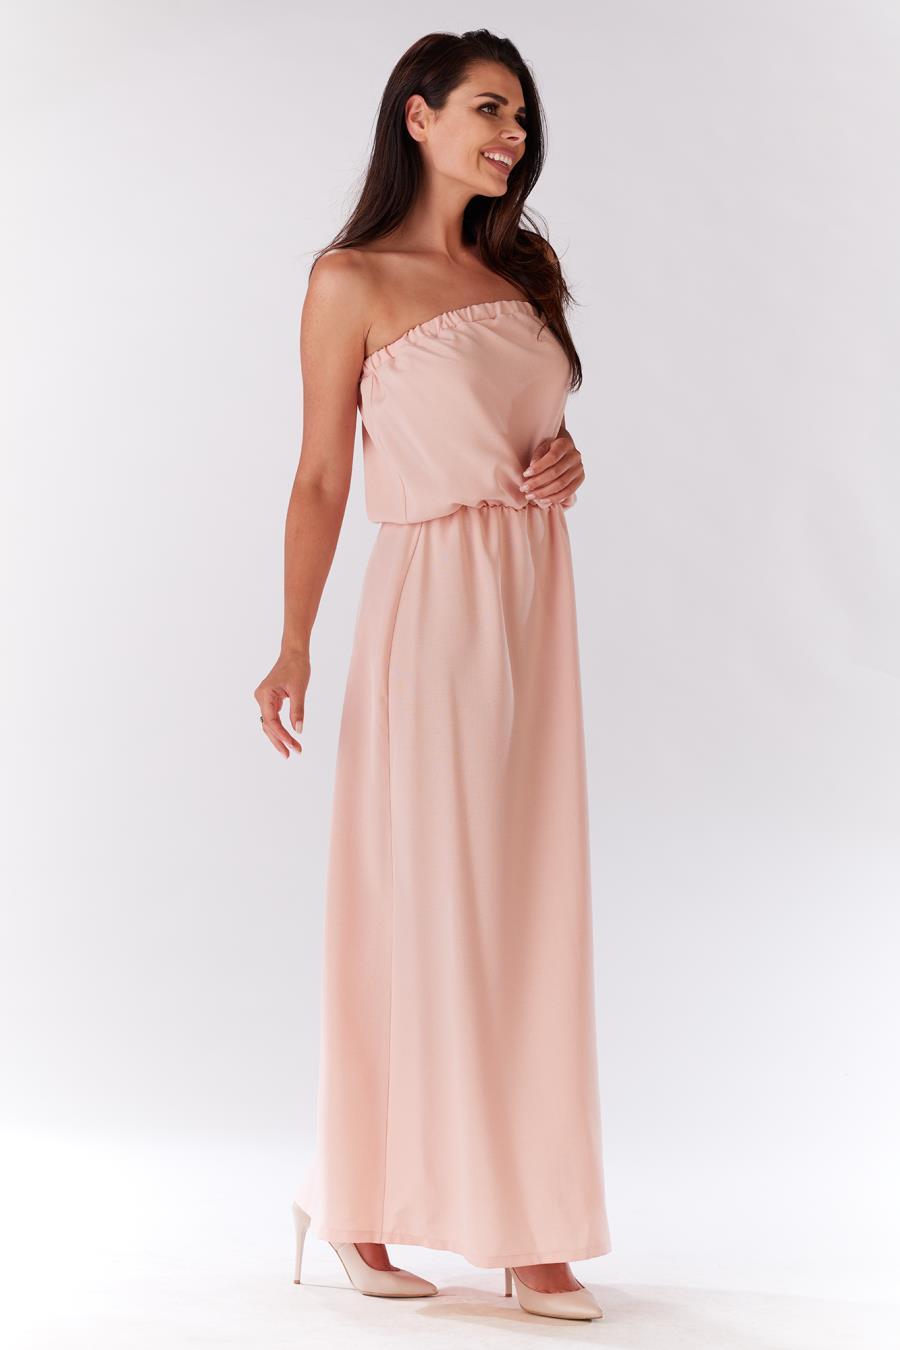 d4d10570408c52 M135, sukienka, infinite, you, pudrowa, letnia, sklep, online ...